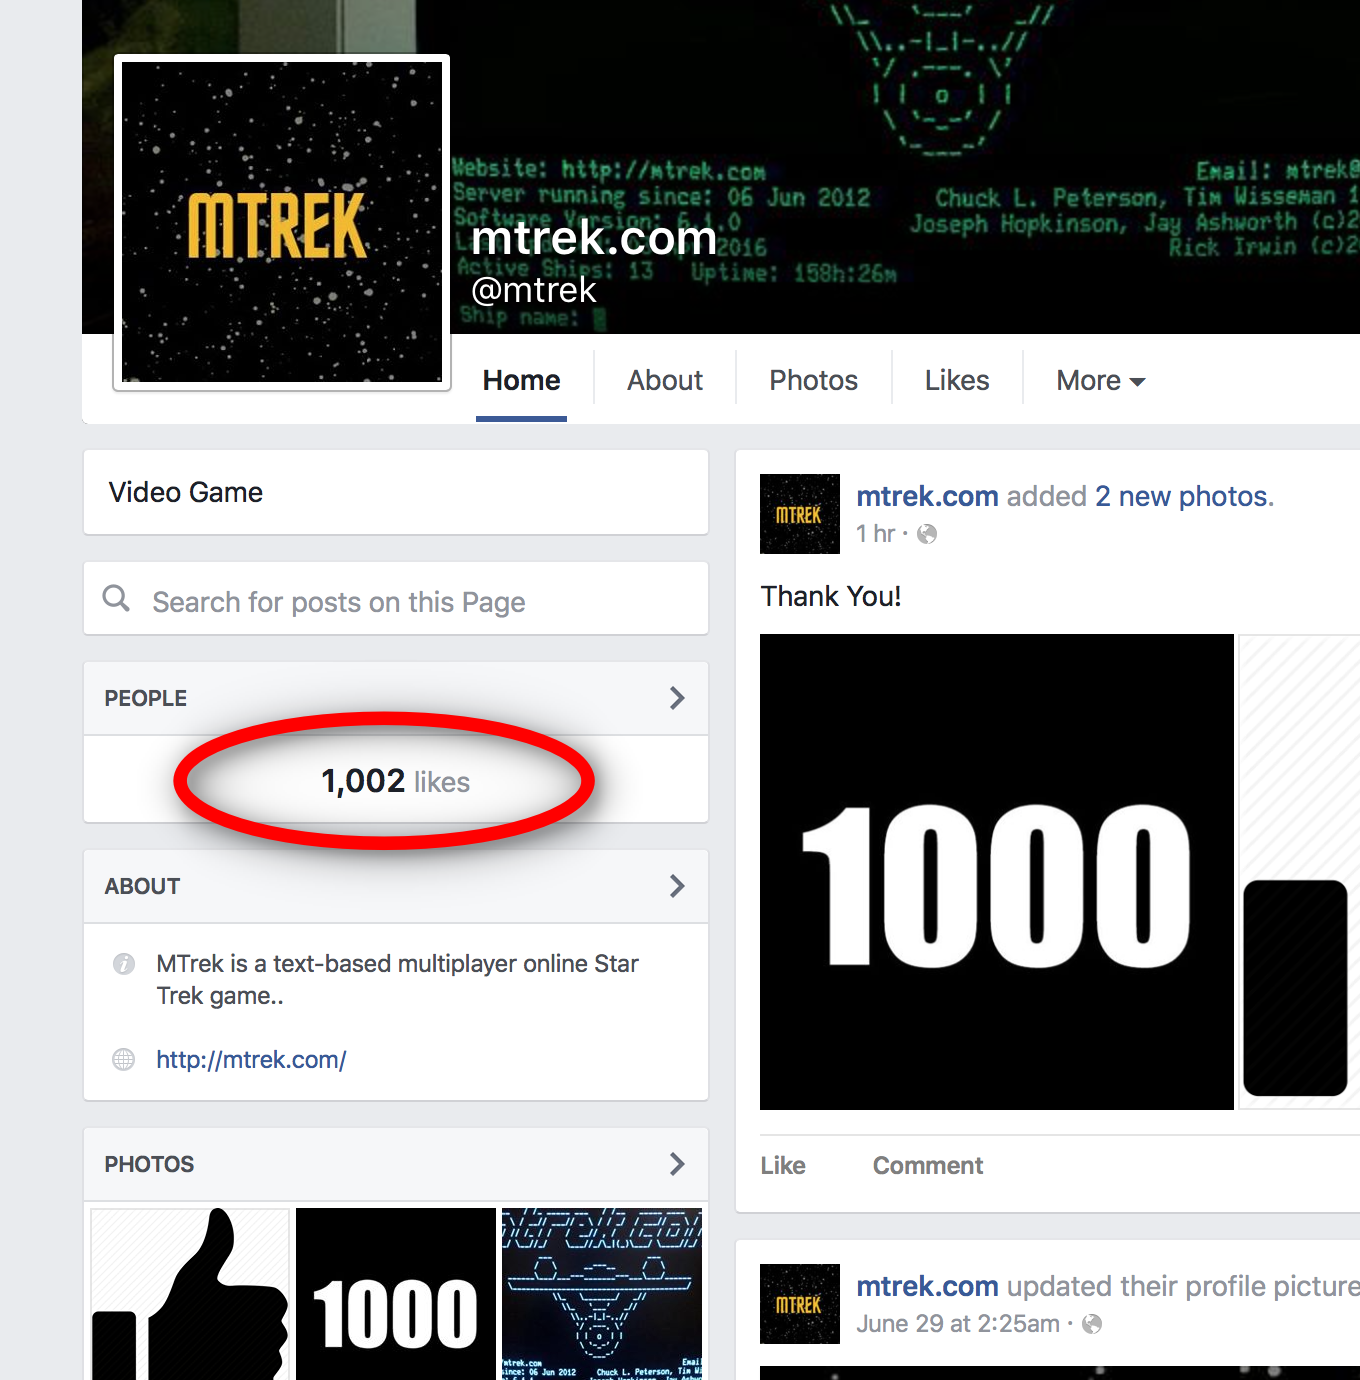 1000 likes!